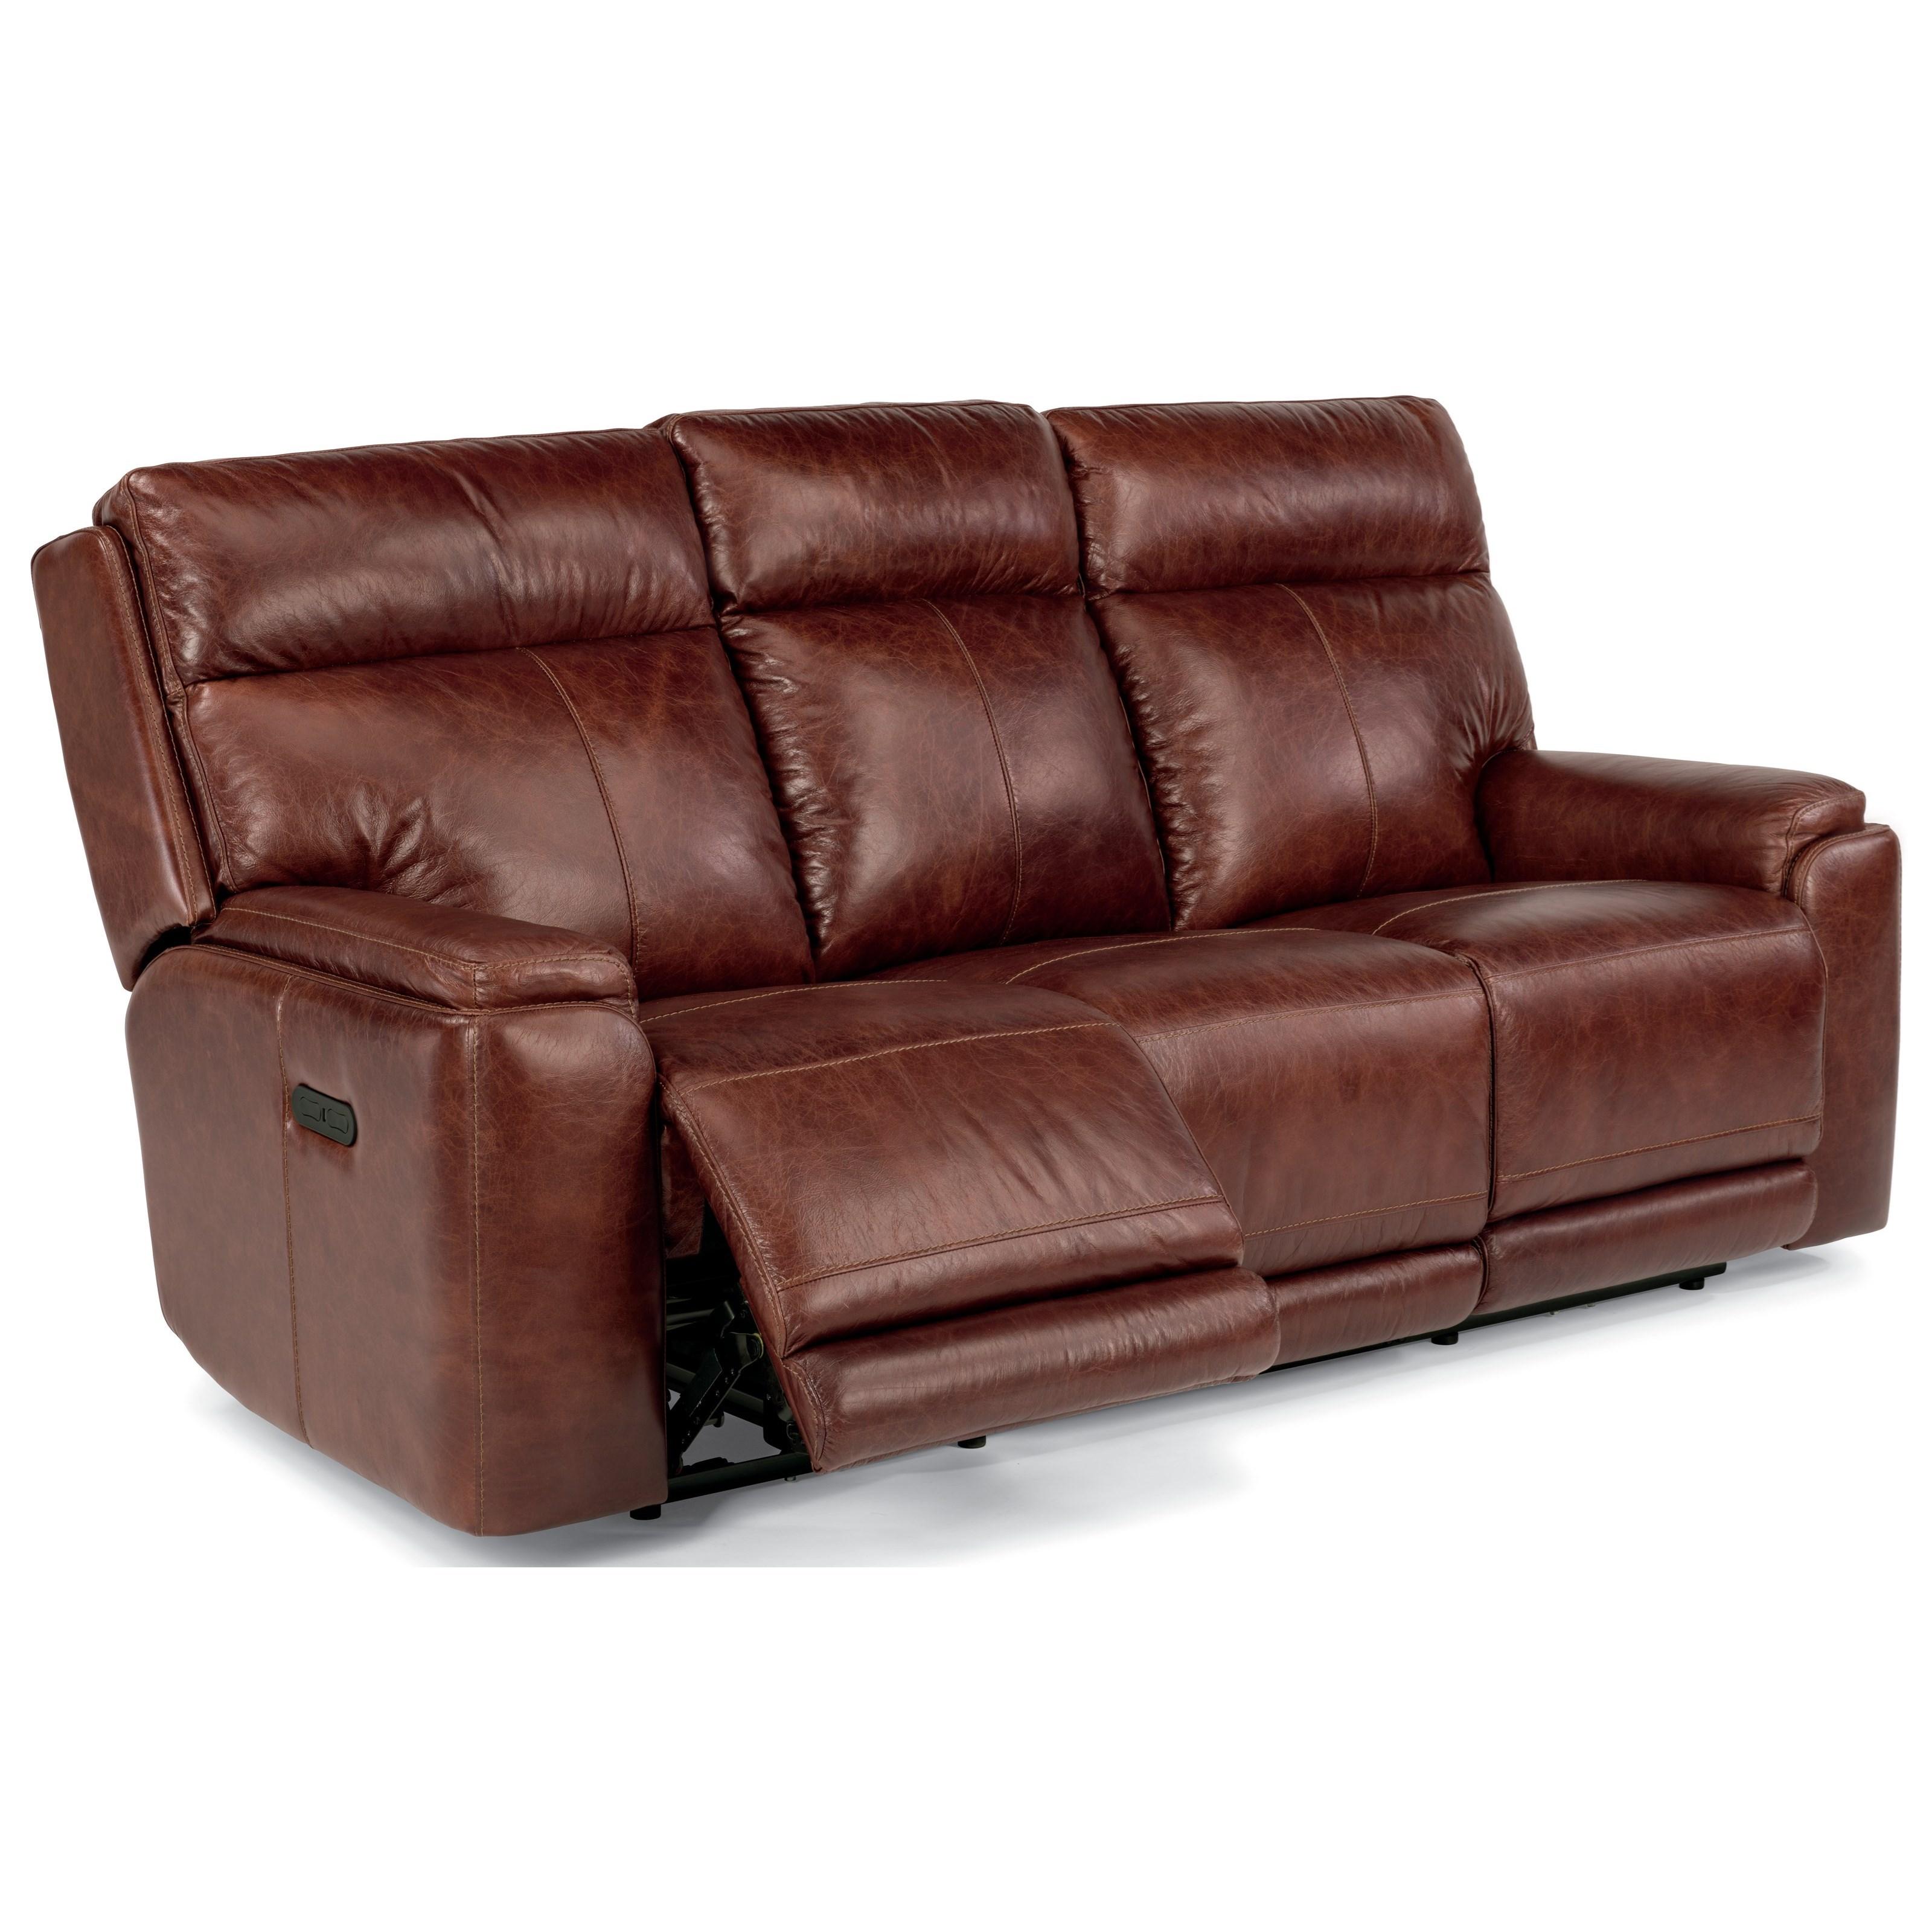 flexsteel power reclining sofa with adjustable headrests and usb ports - Flexsteel Sofas